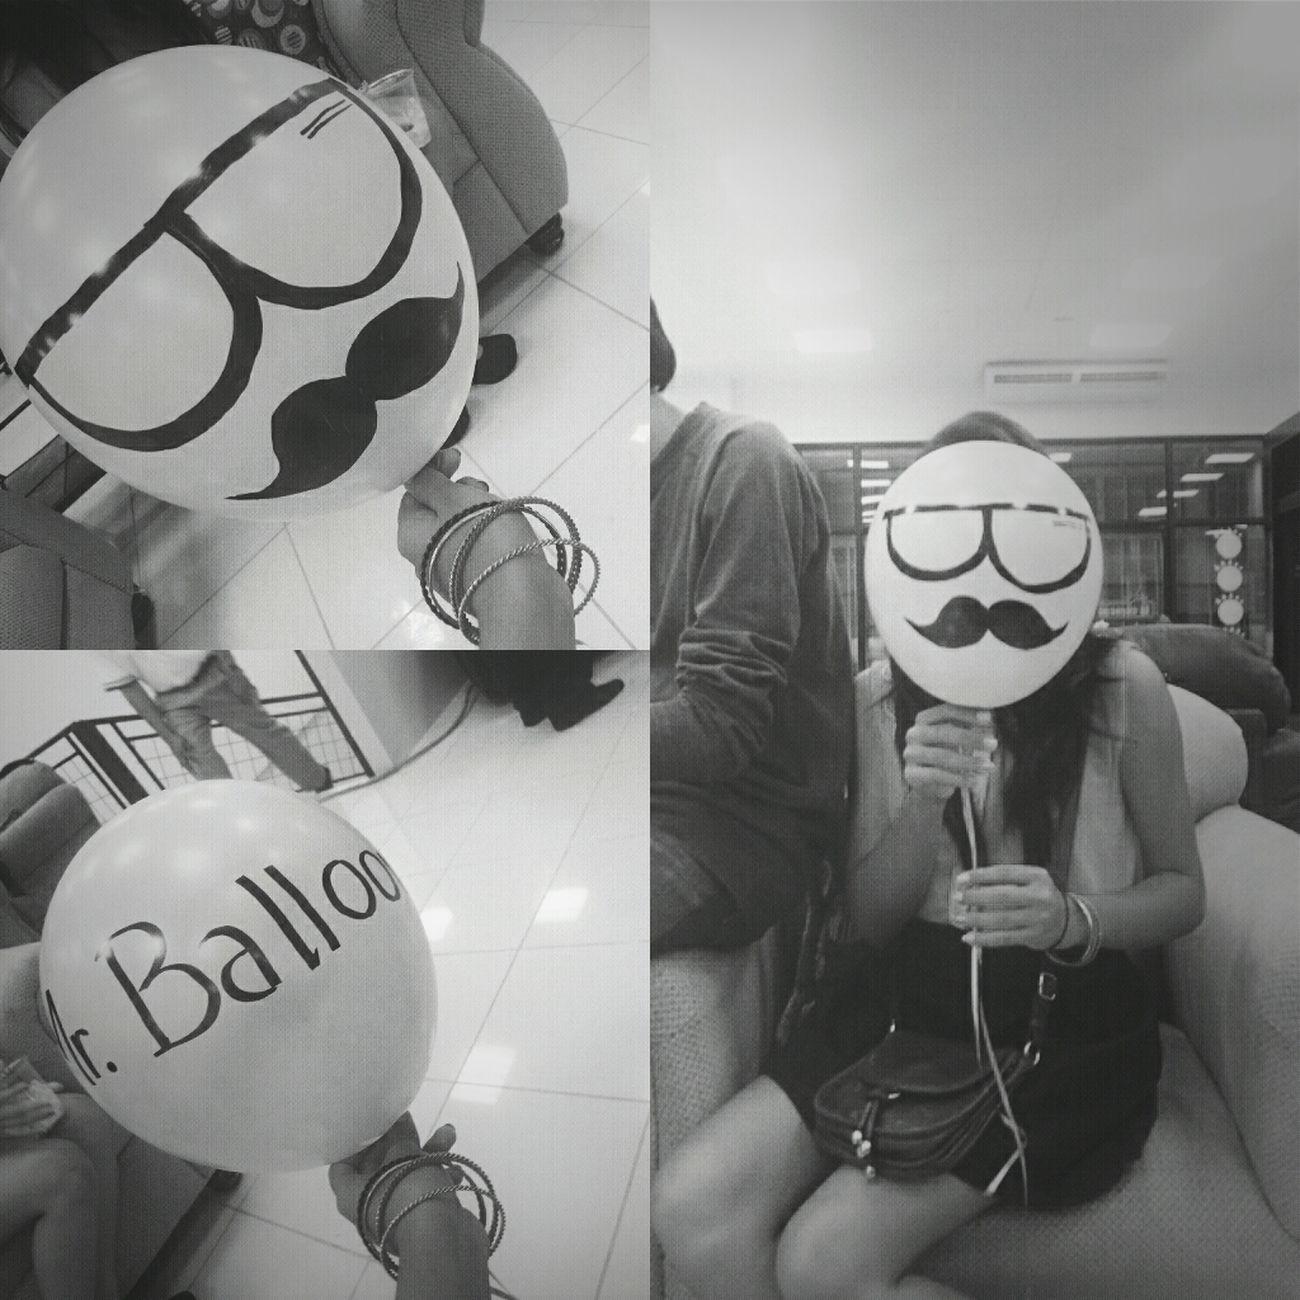 Mr. Ballon ;D